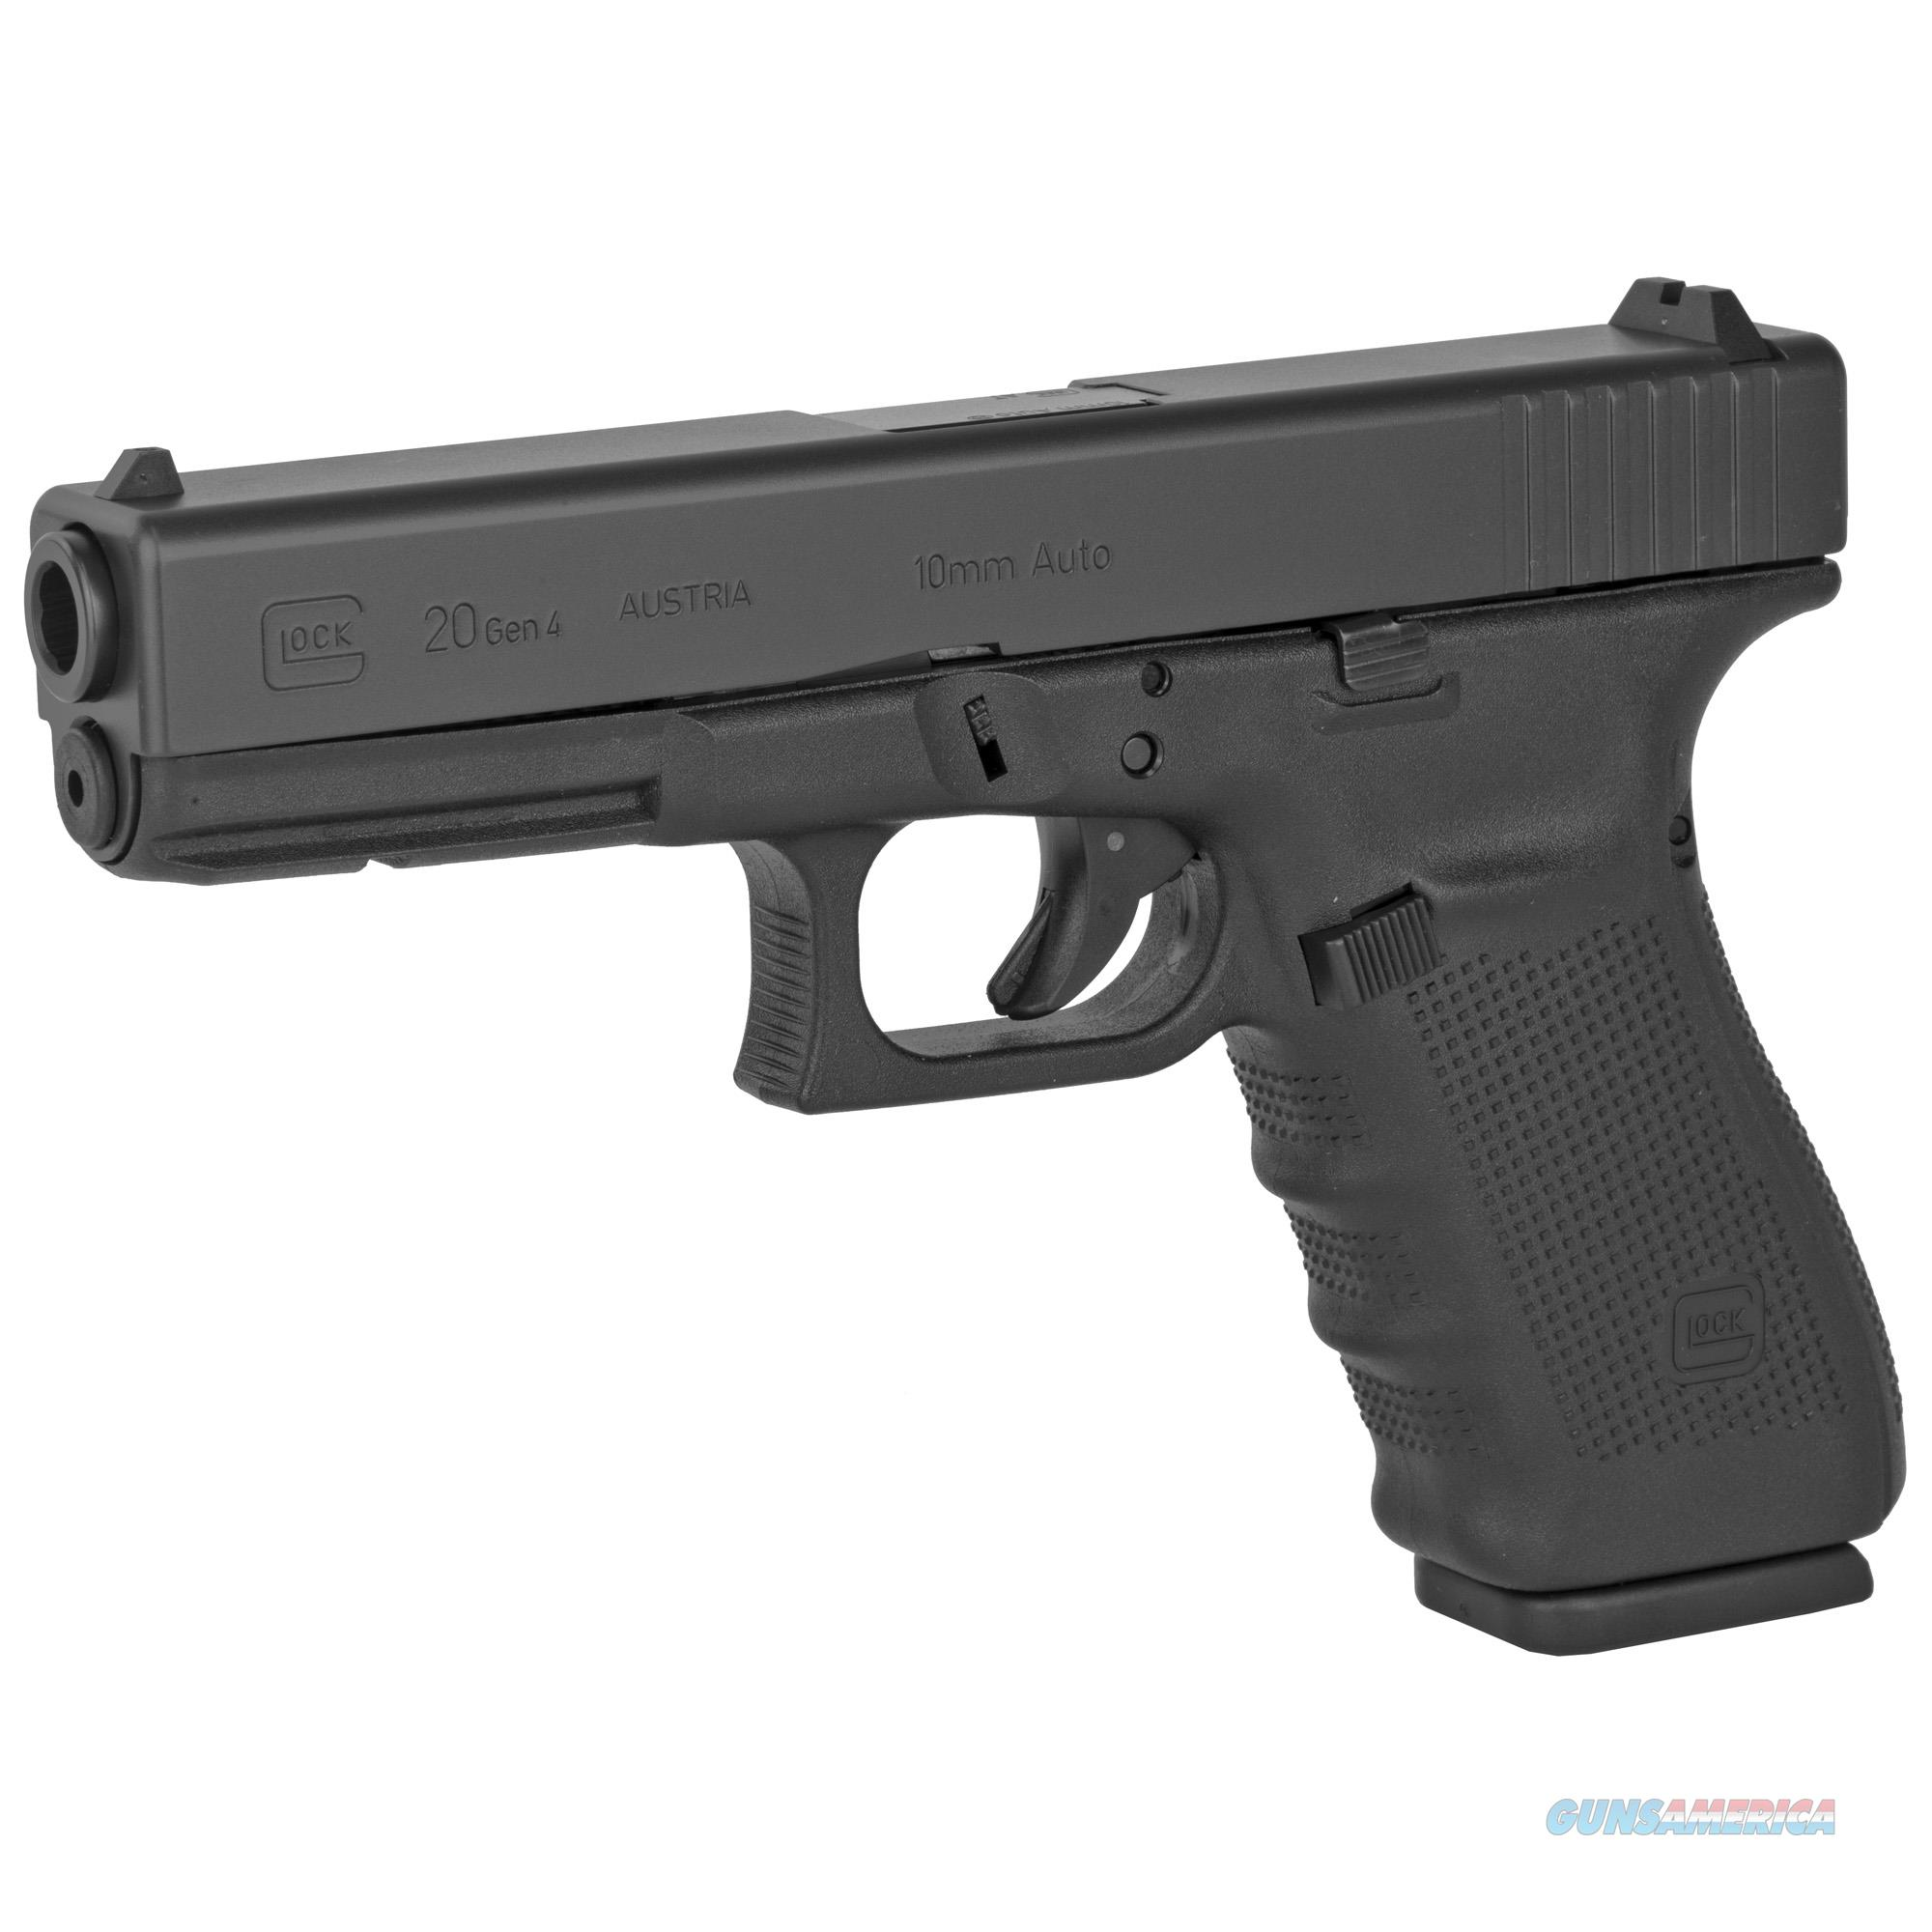 "Glock G20 Gen4 10mm 4.6"" 15+1 - New in Case  Guns > Pistols > Glock Pistols > 20/21"